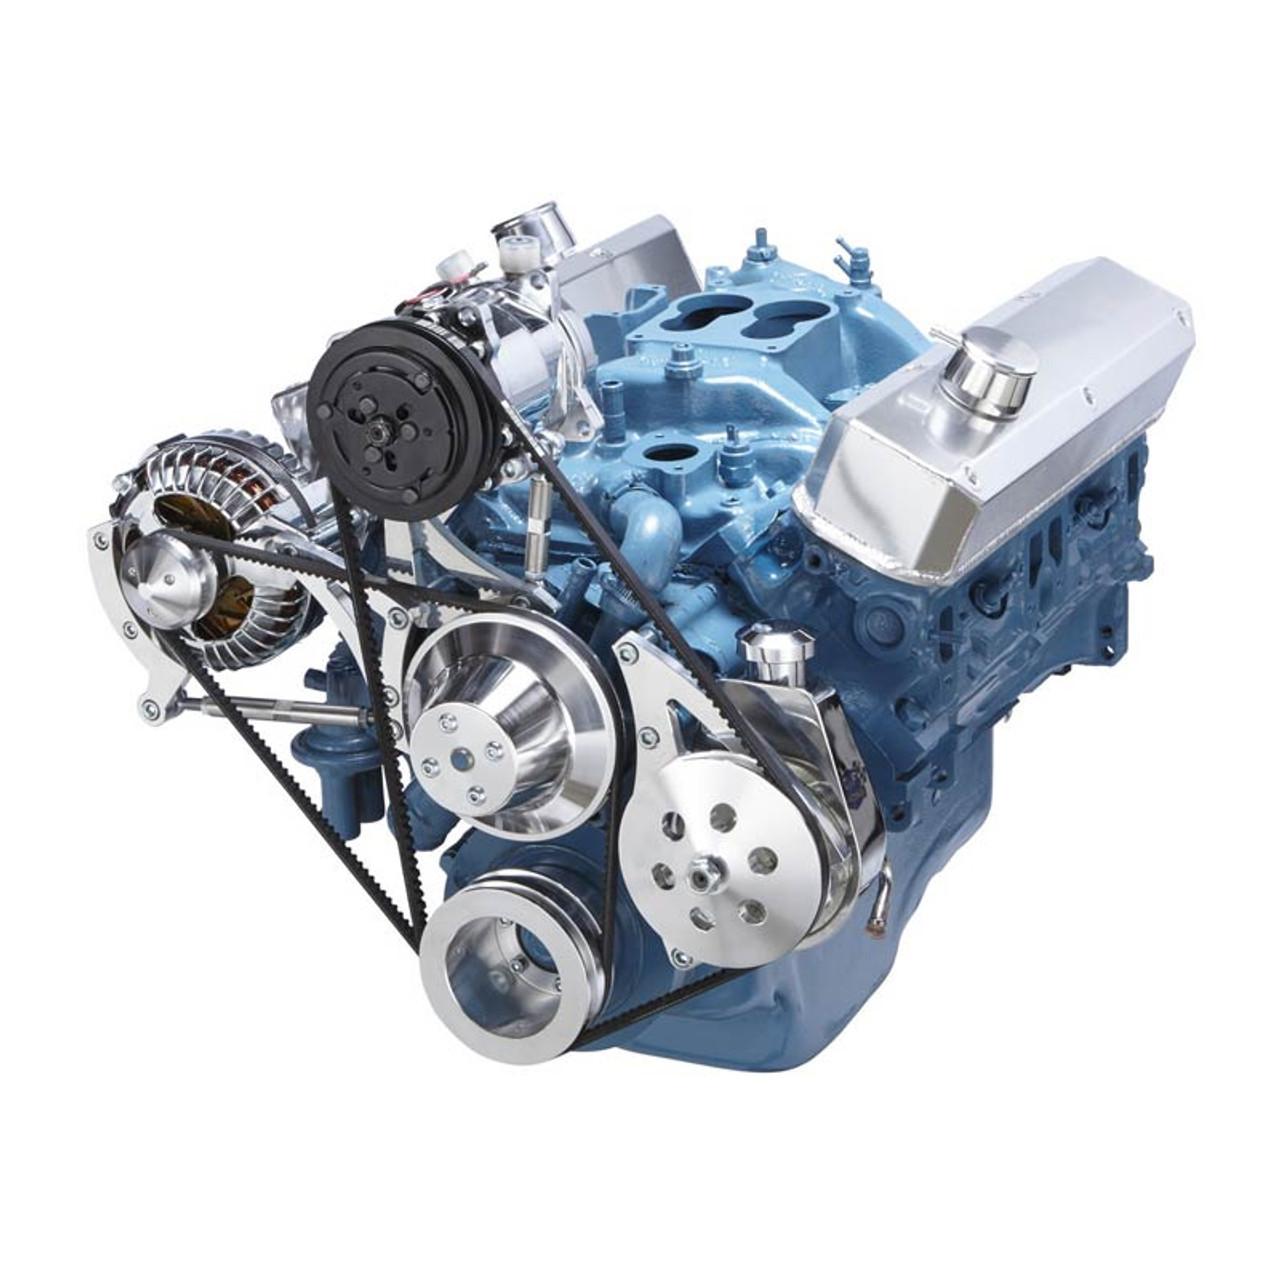 318 engine pulley diagram auto electrical wiring diagram u2022 rh 6weeks co uk